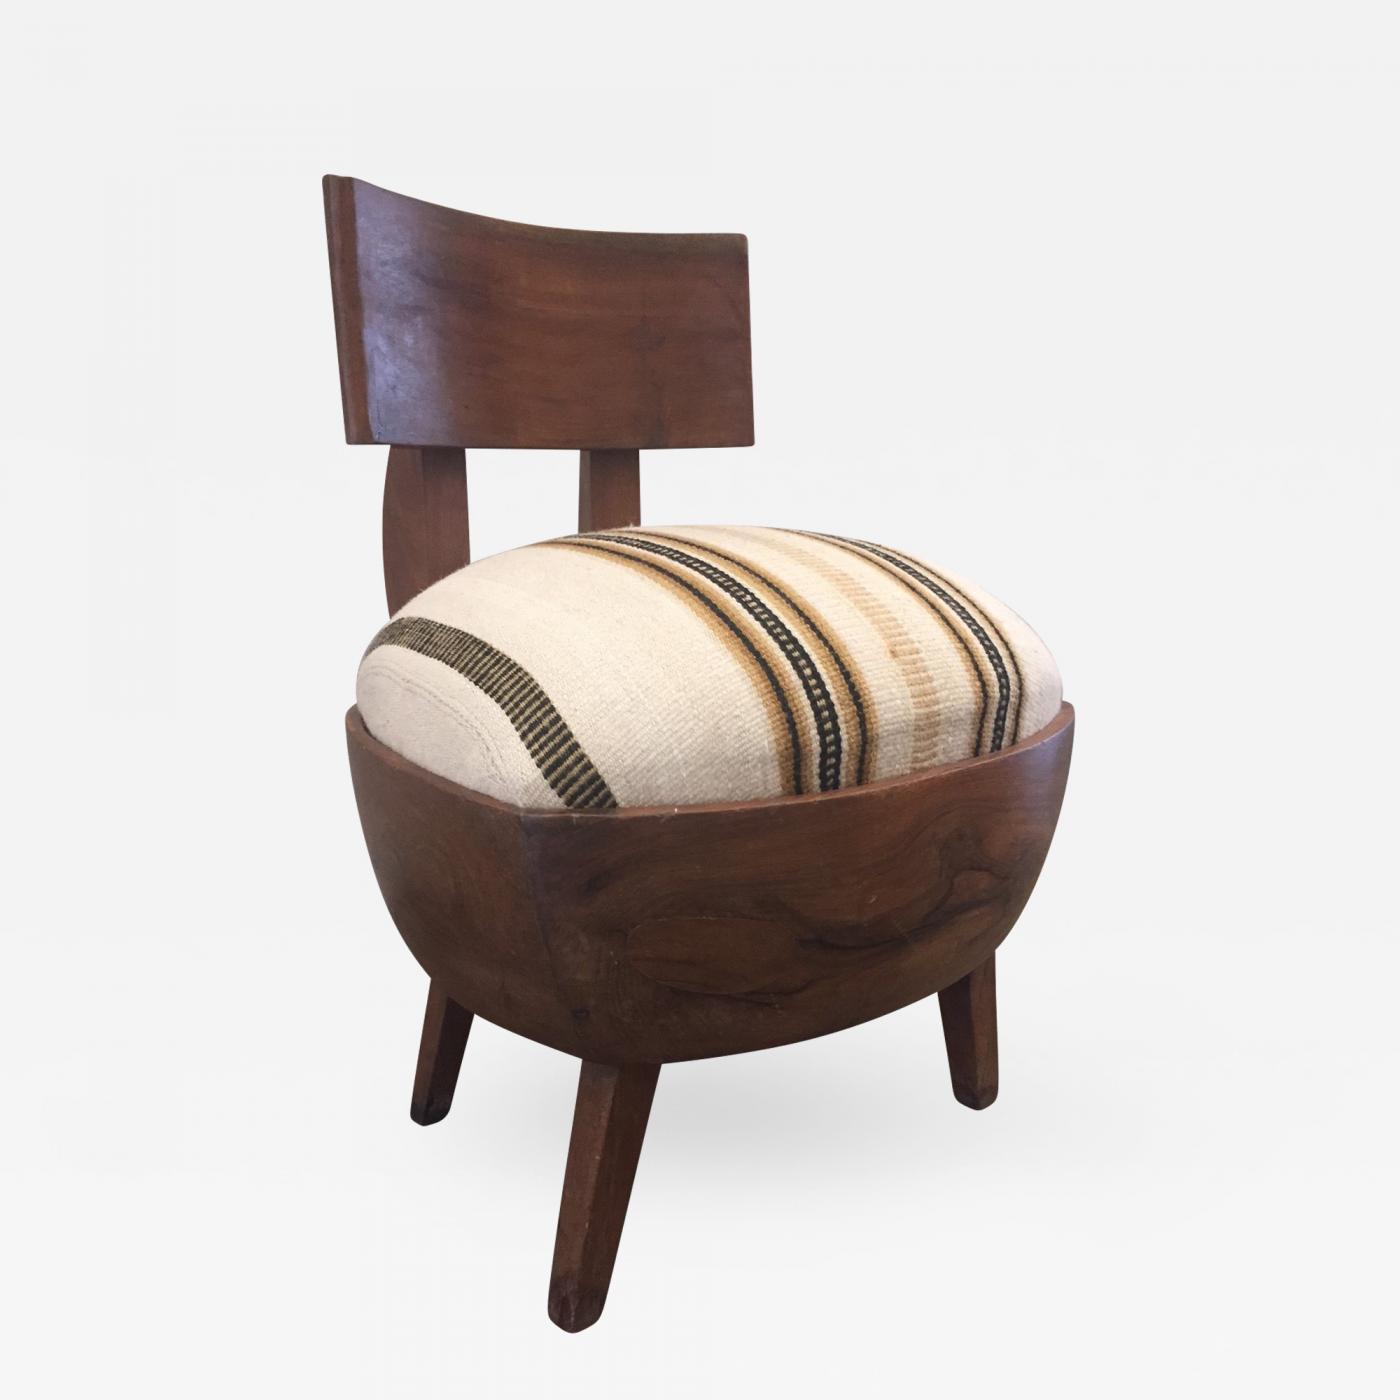 Cool Early French Art Deco Petite Slipper Chair Creativecarmelina Interior Chair Design Creativecarmelinacom